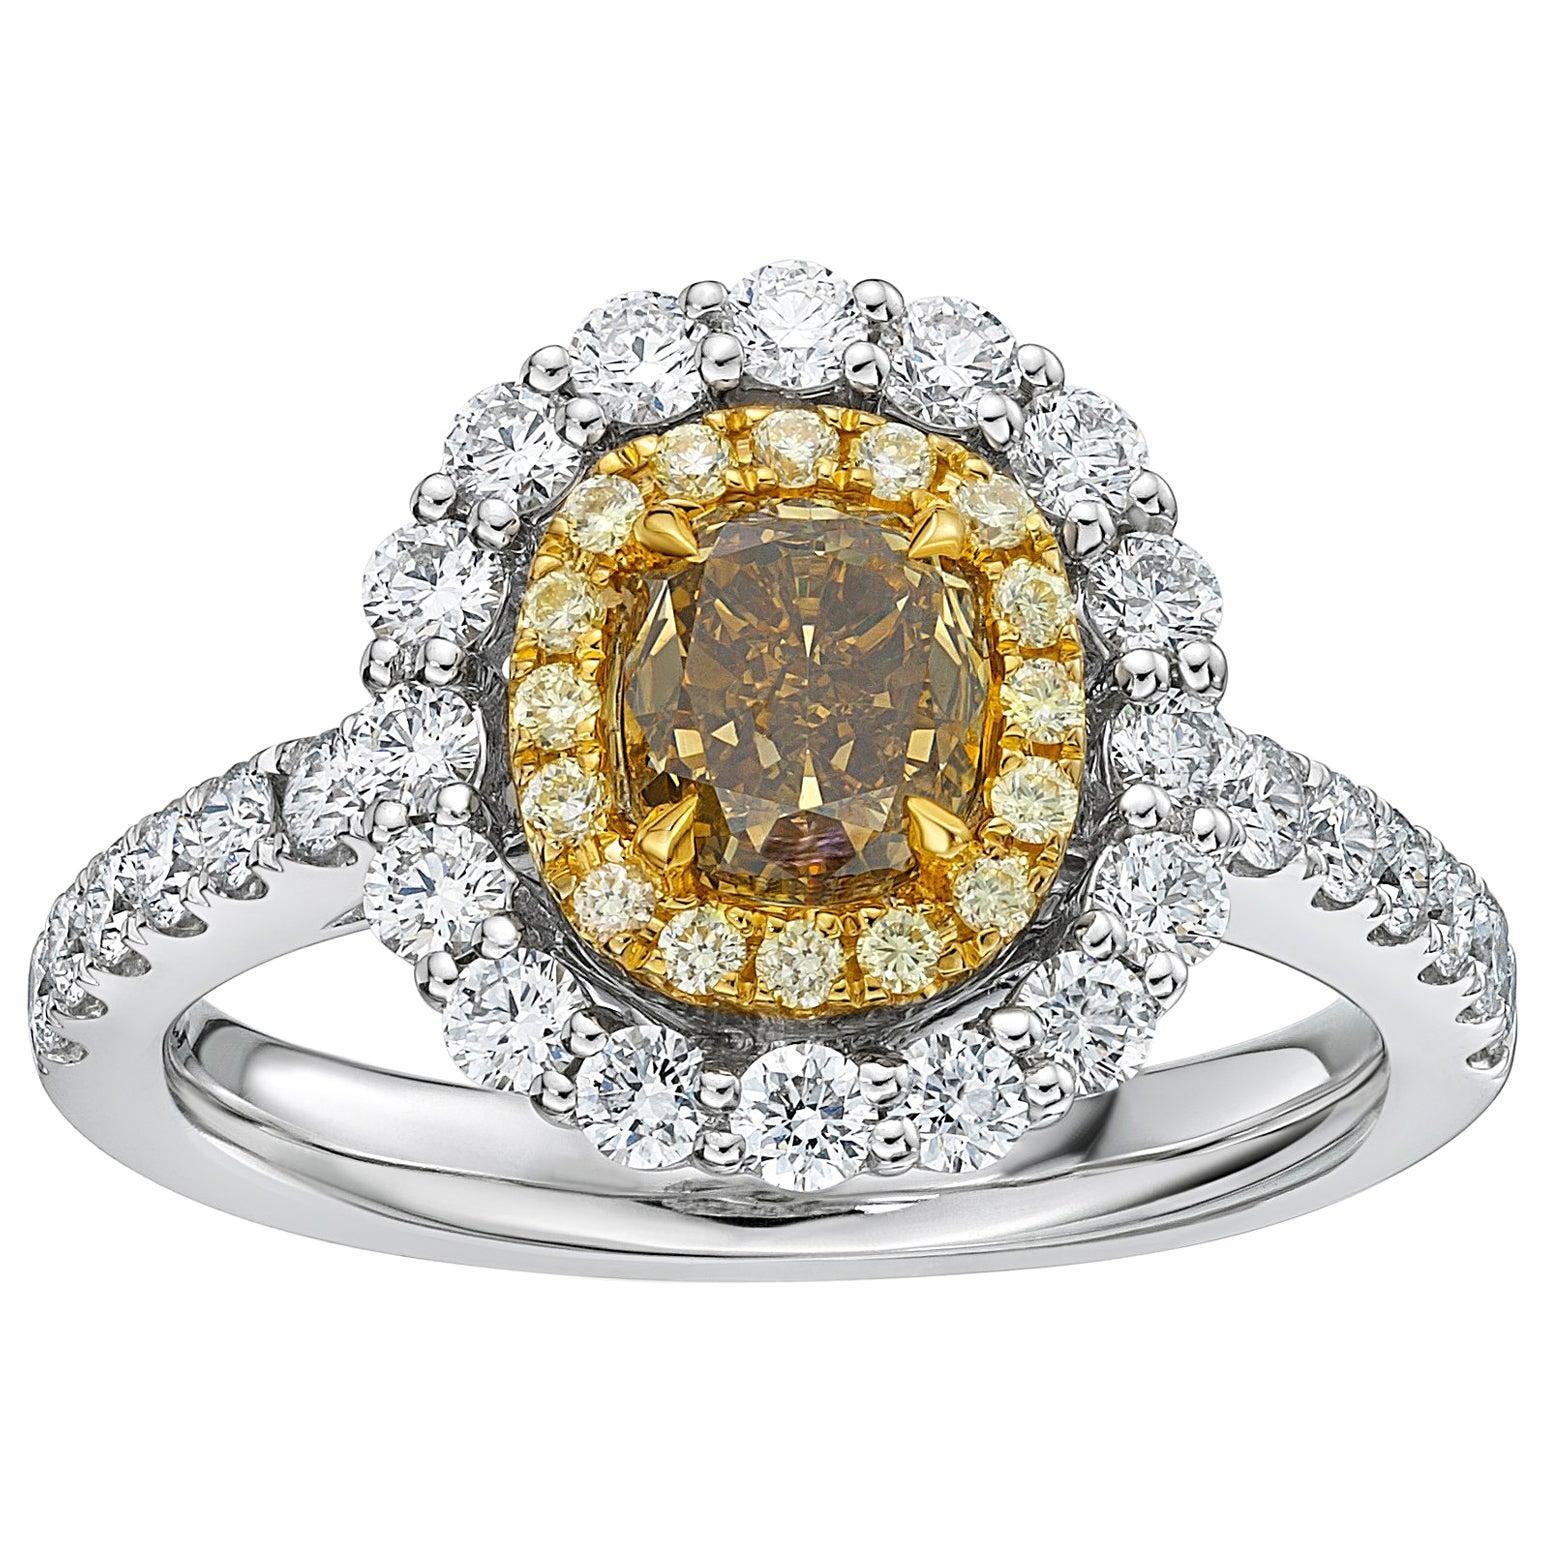 GIA Certified 1.15 Carat Fancy Deep Brownish Greenish Yellow Diamond Ring